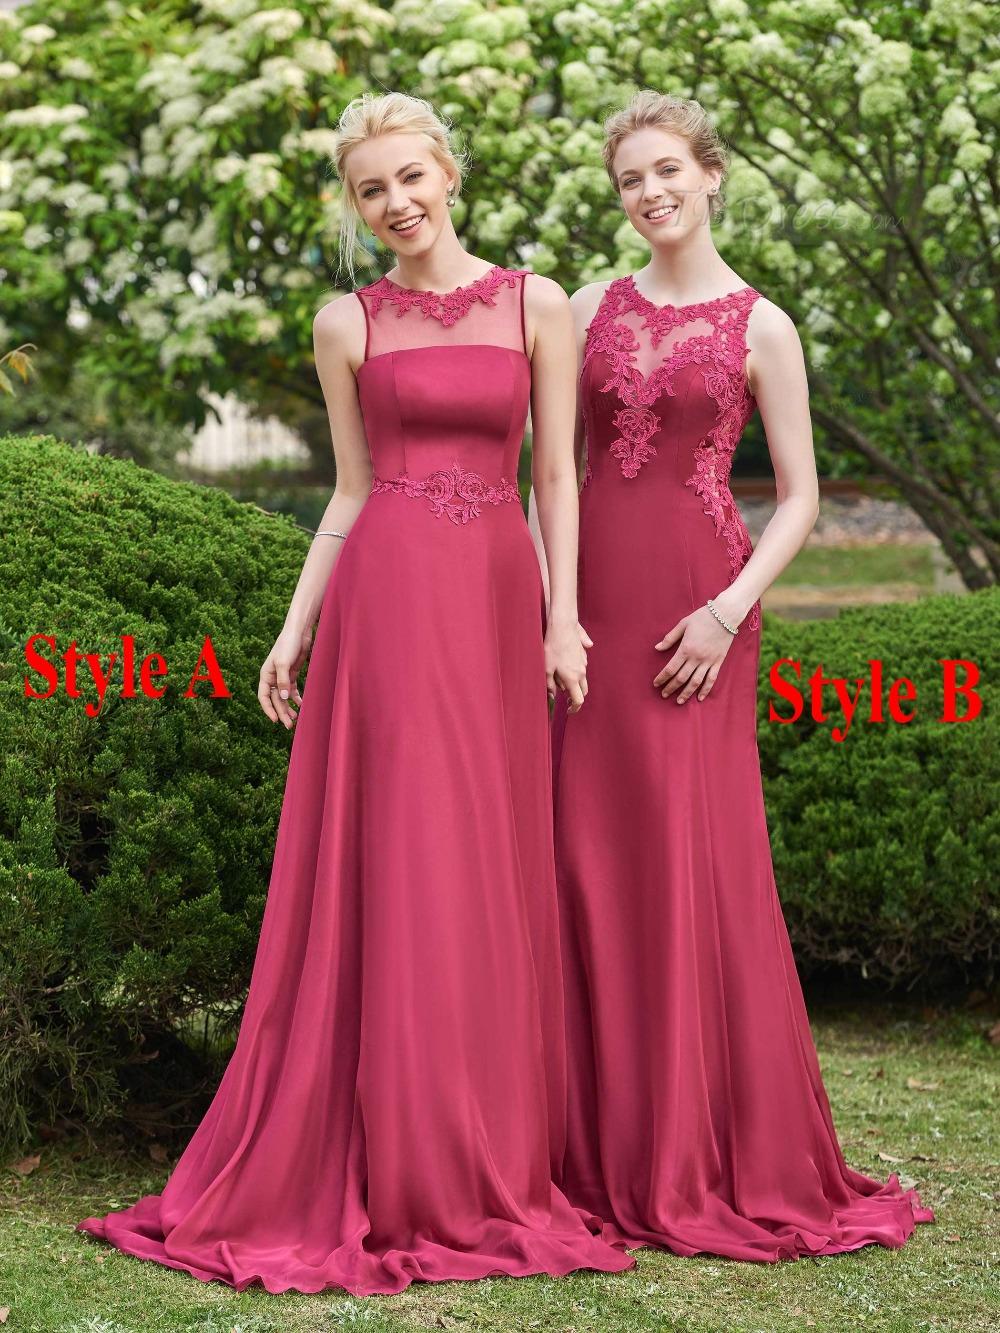 Latest lace short dress patterns 2018